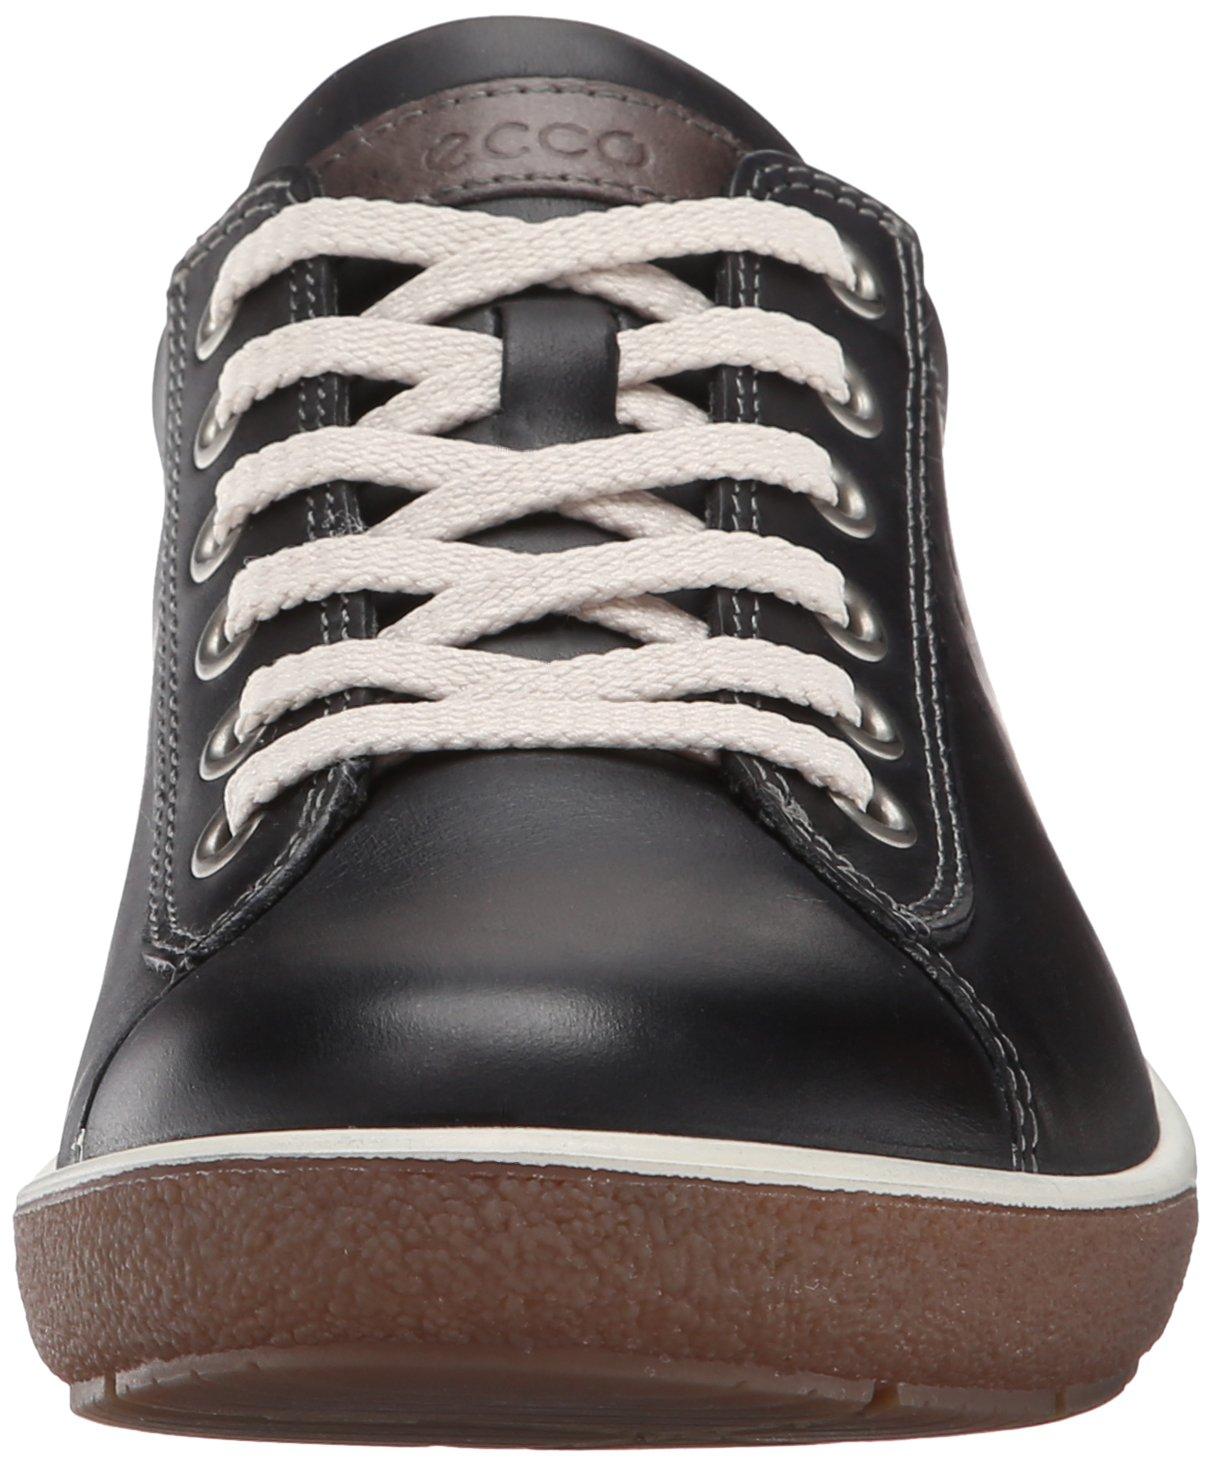 Ecco Footwear Womens Chase II Lace Shoe, Black, 39 EU/8-8.5 M US by ECCO (Image #4)